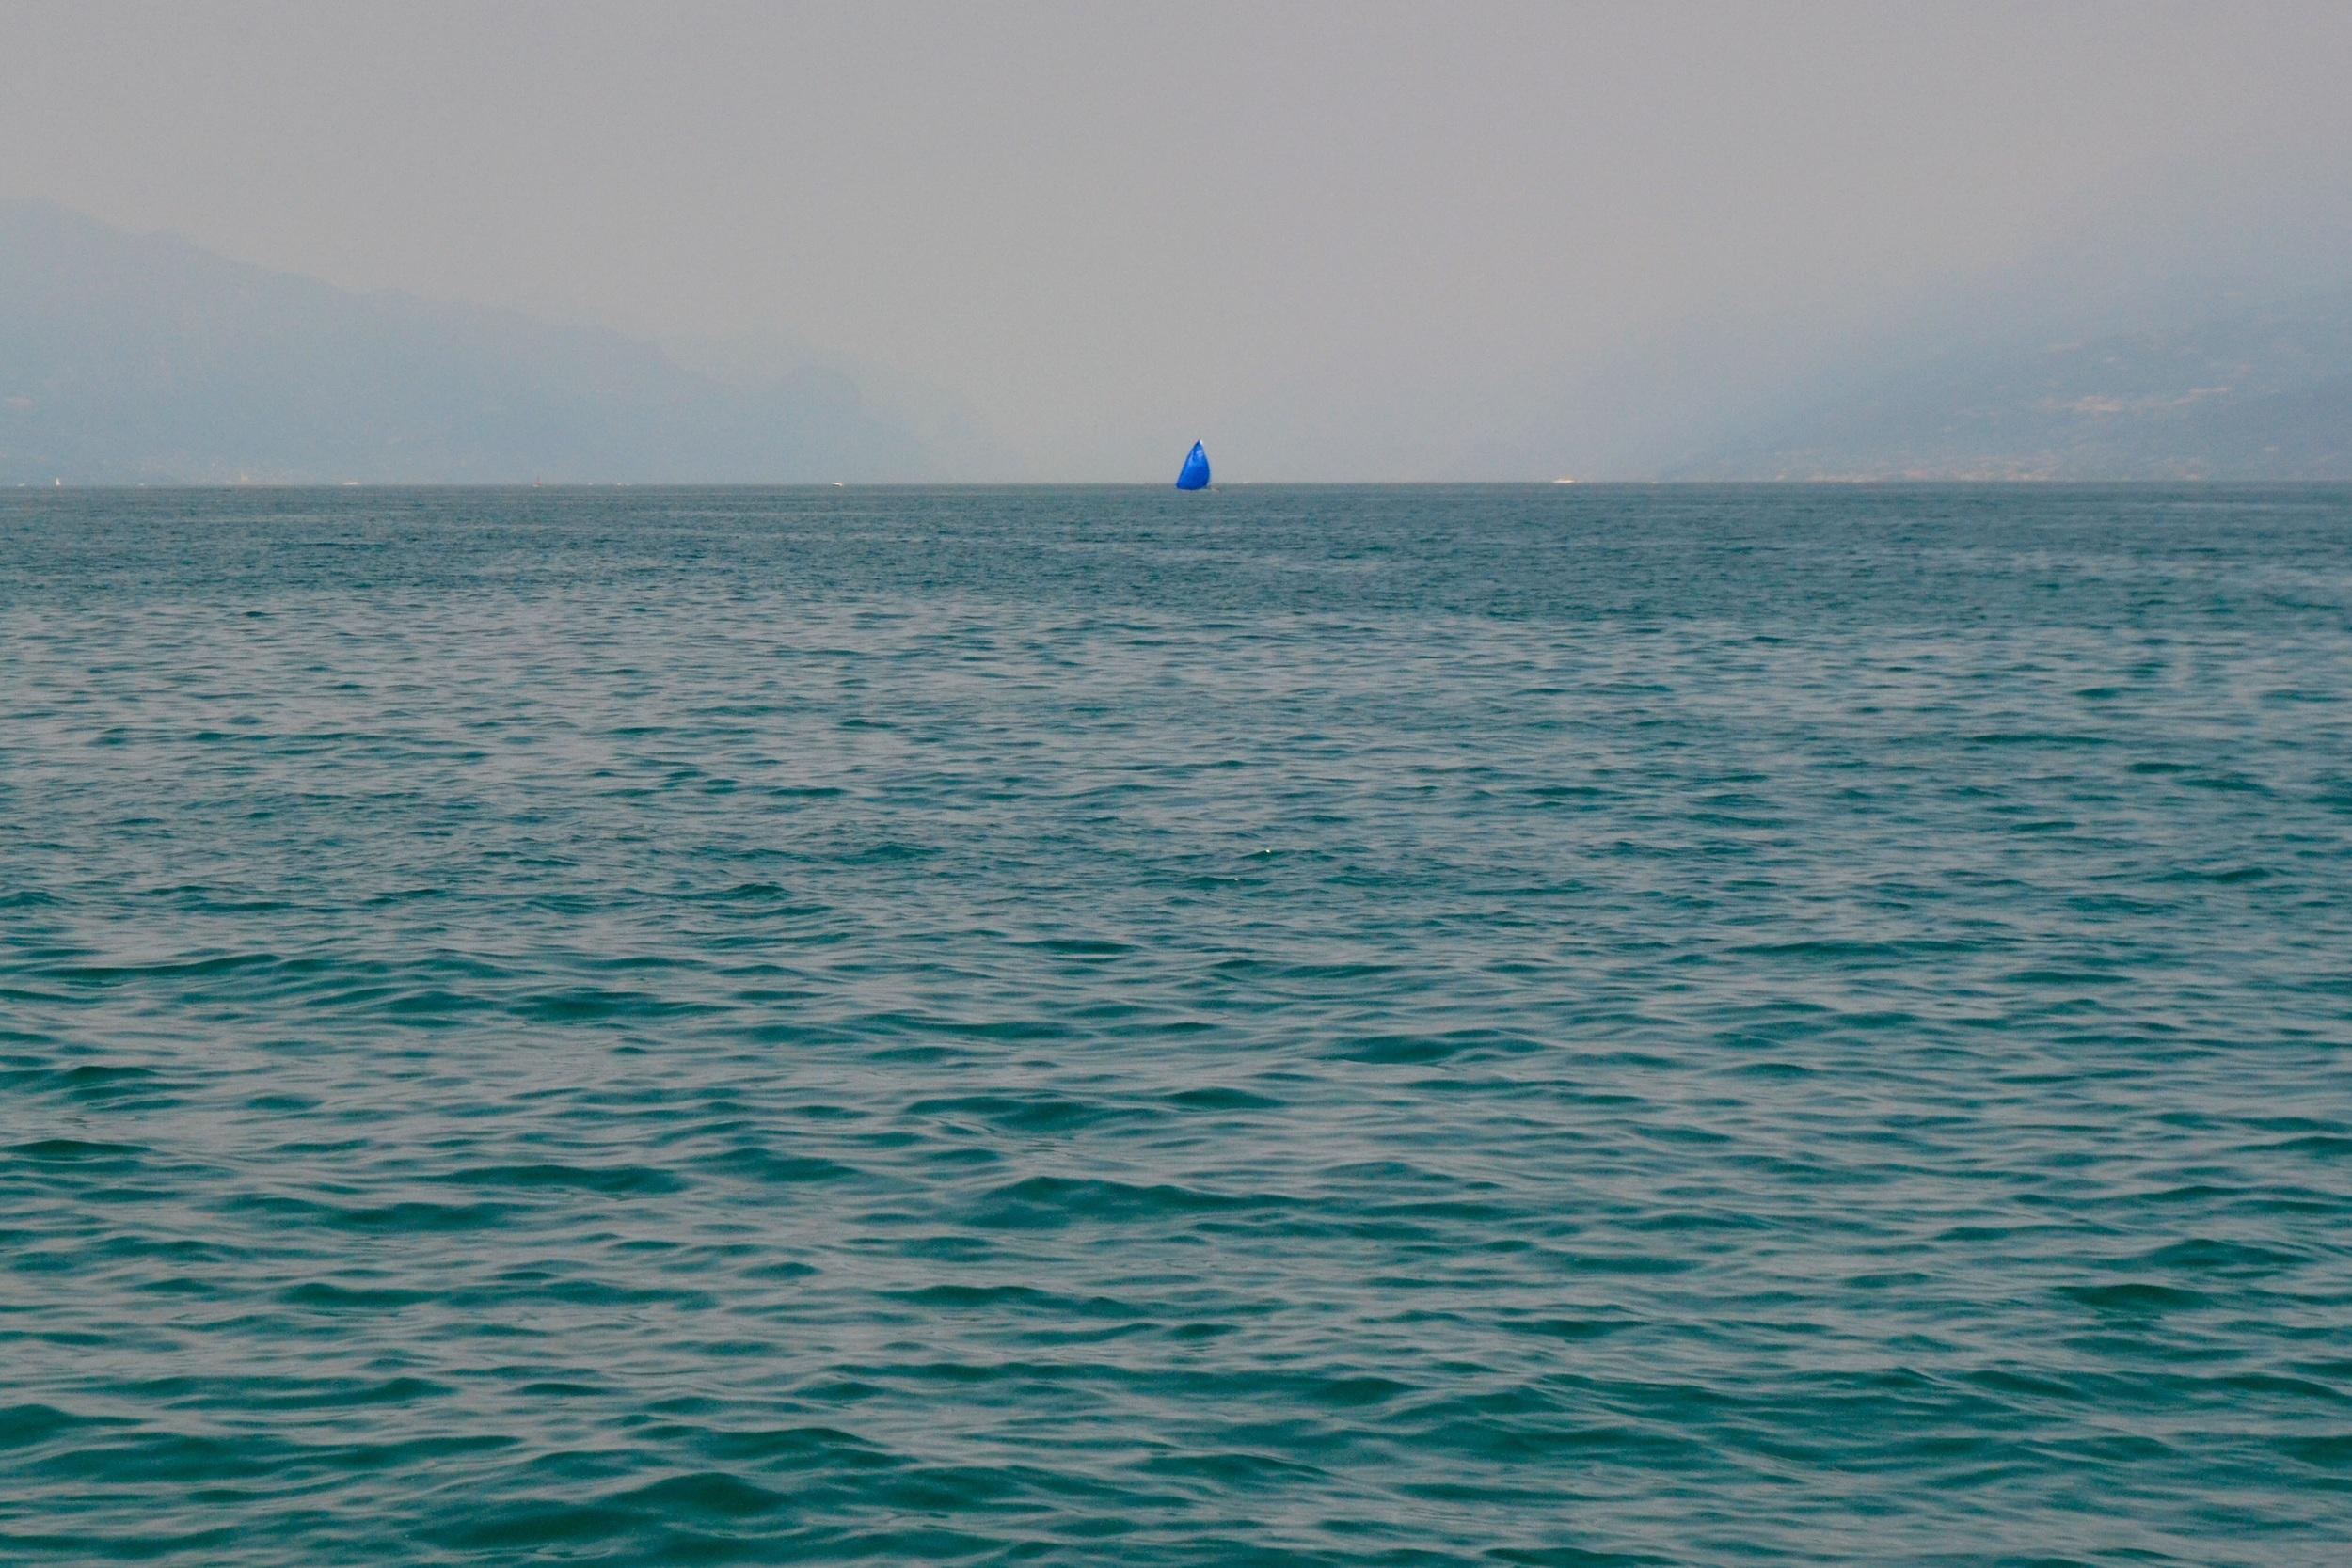 Lone blue sailboat on Lago di Garda.